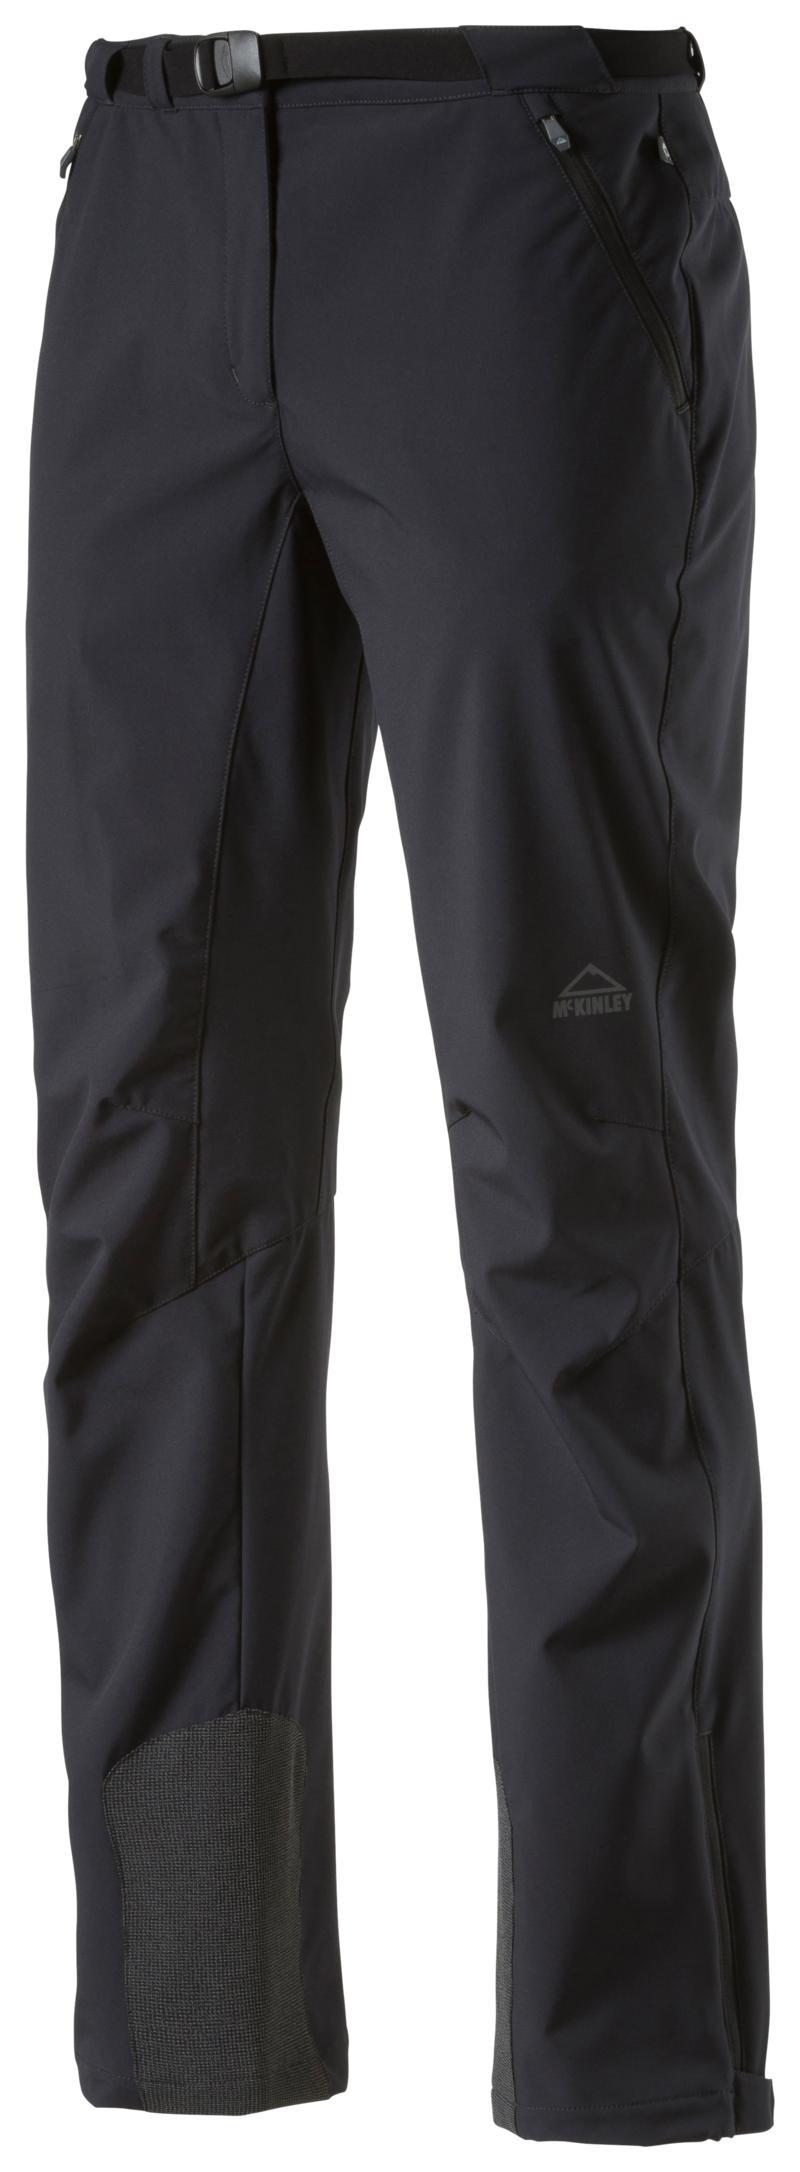 McKinley KATIKATI II WMS, ženske pohodne hlače, črna